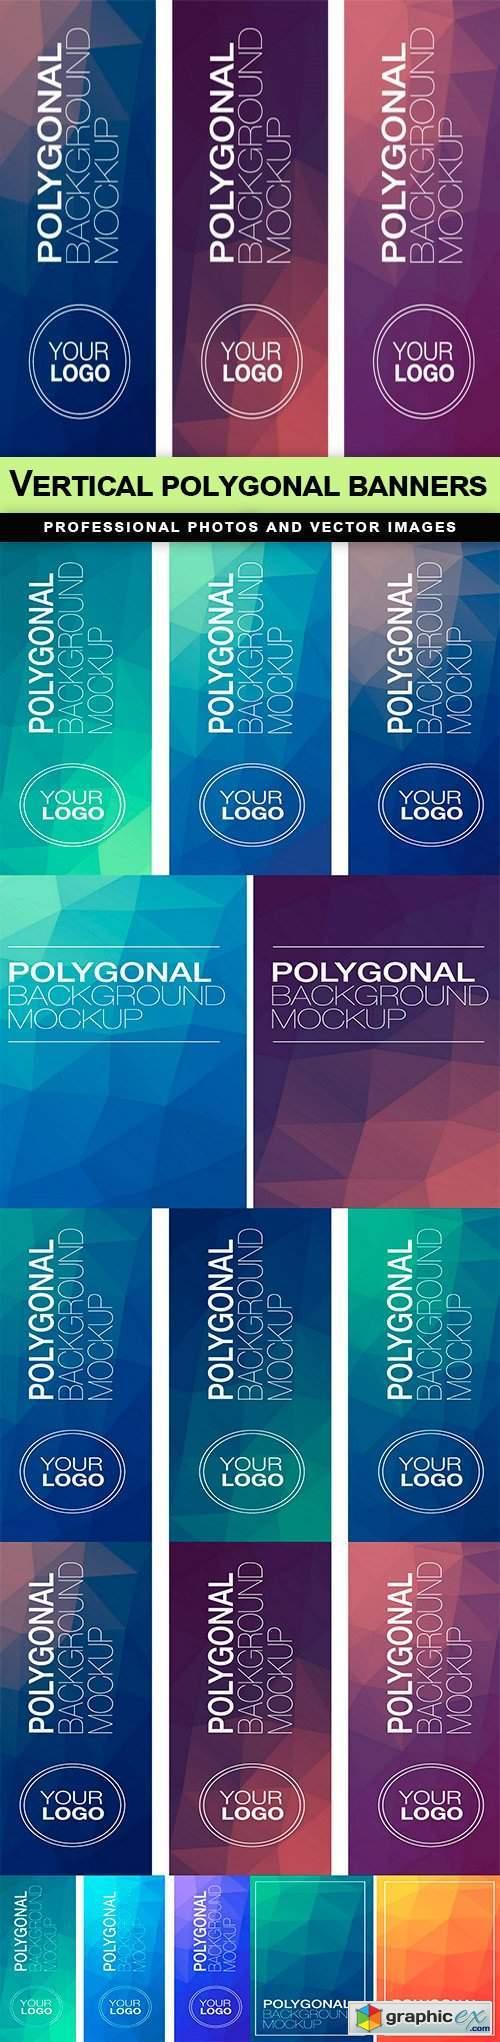 Vertical polygonal banners - 6 EPS